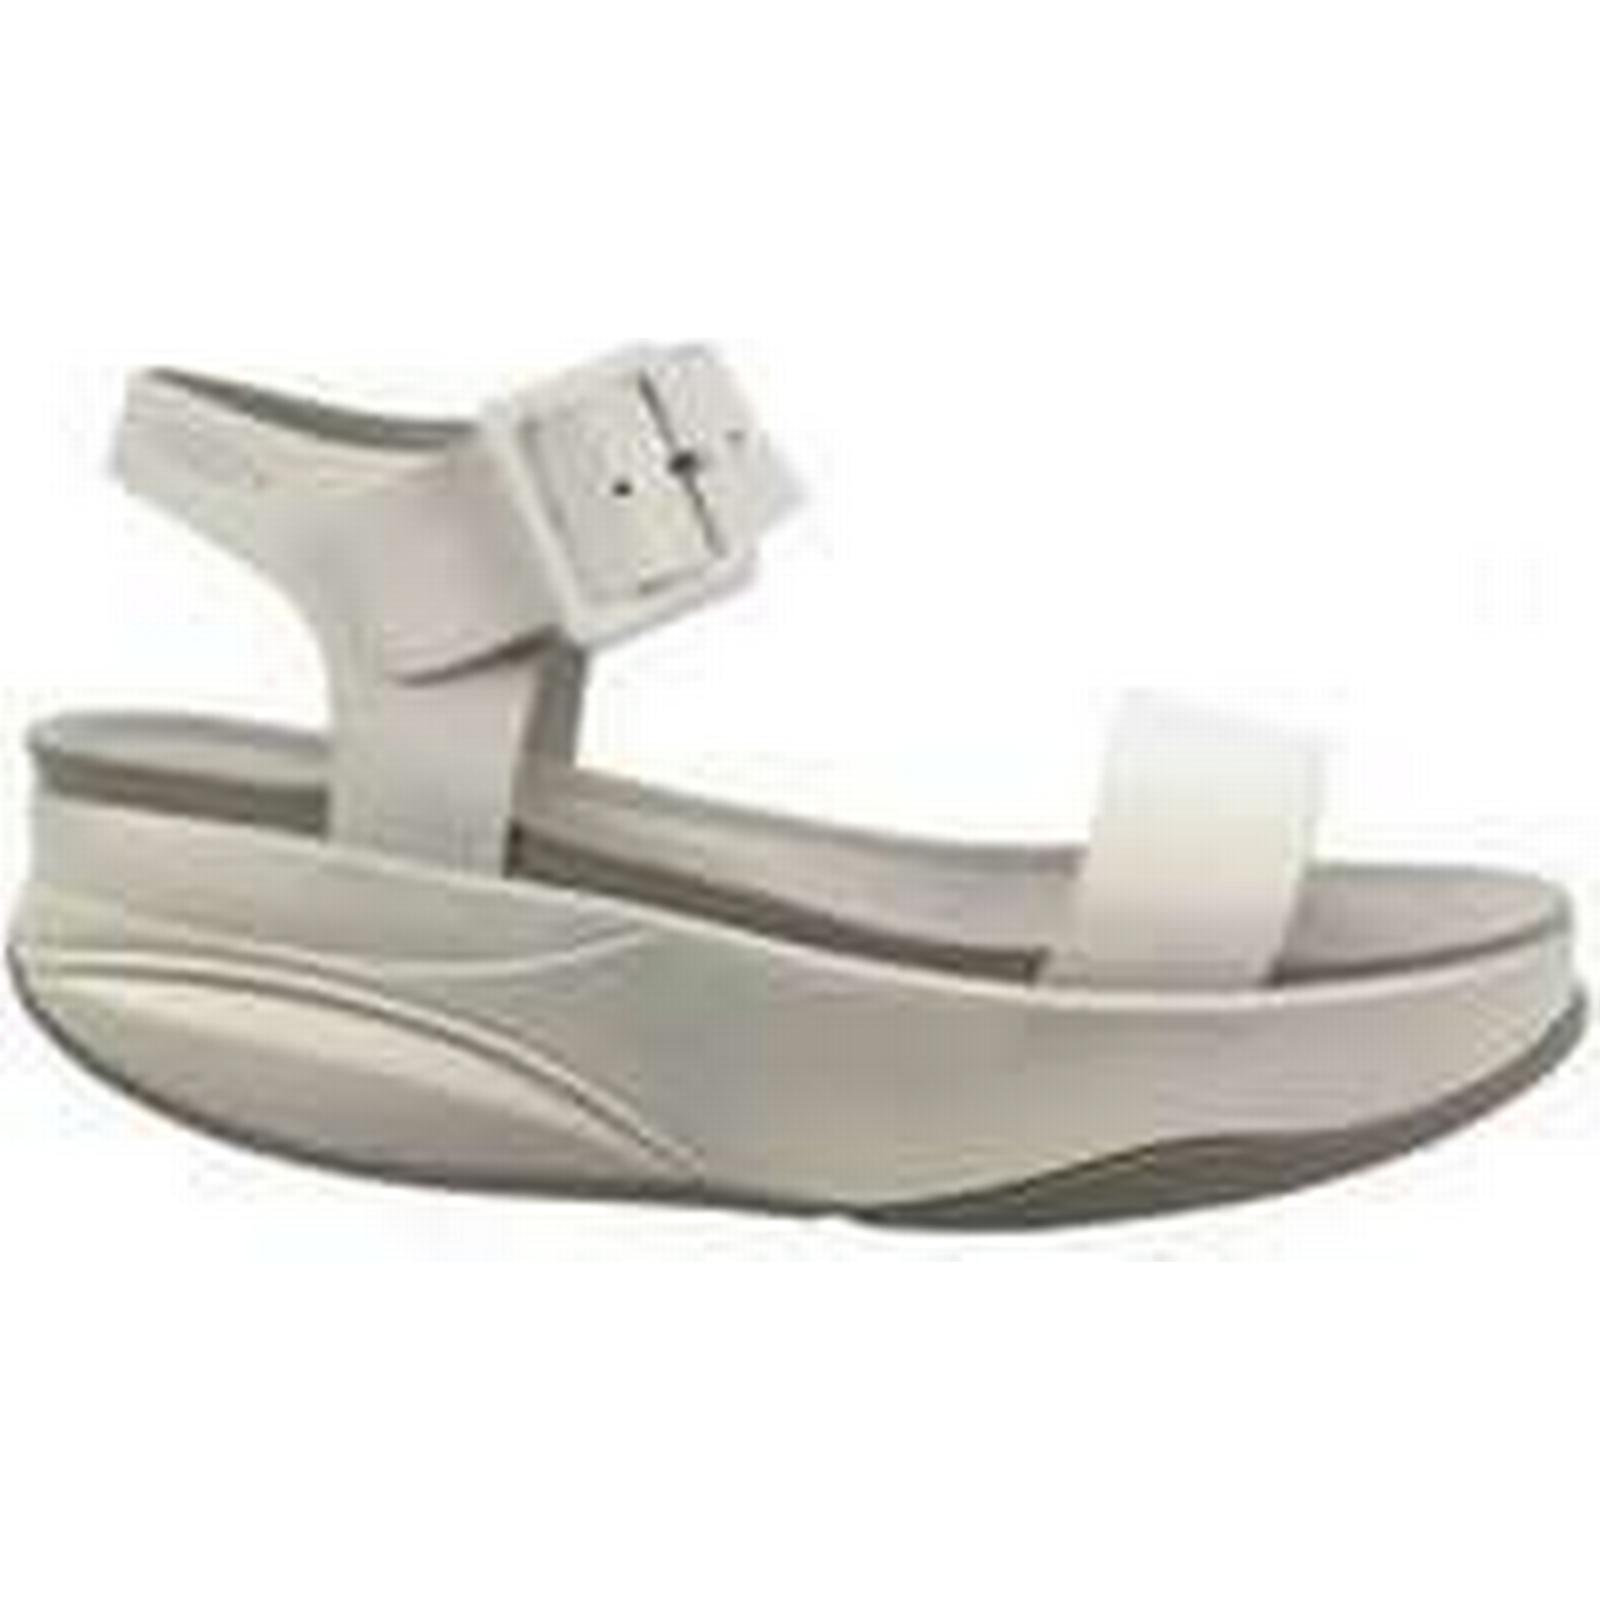 Spartoo.co.uk Mbt women's MANNI W women's Mbt Sandals in White ffabcc